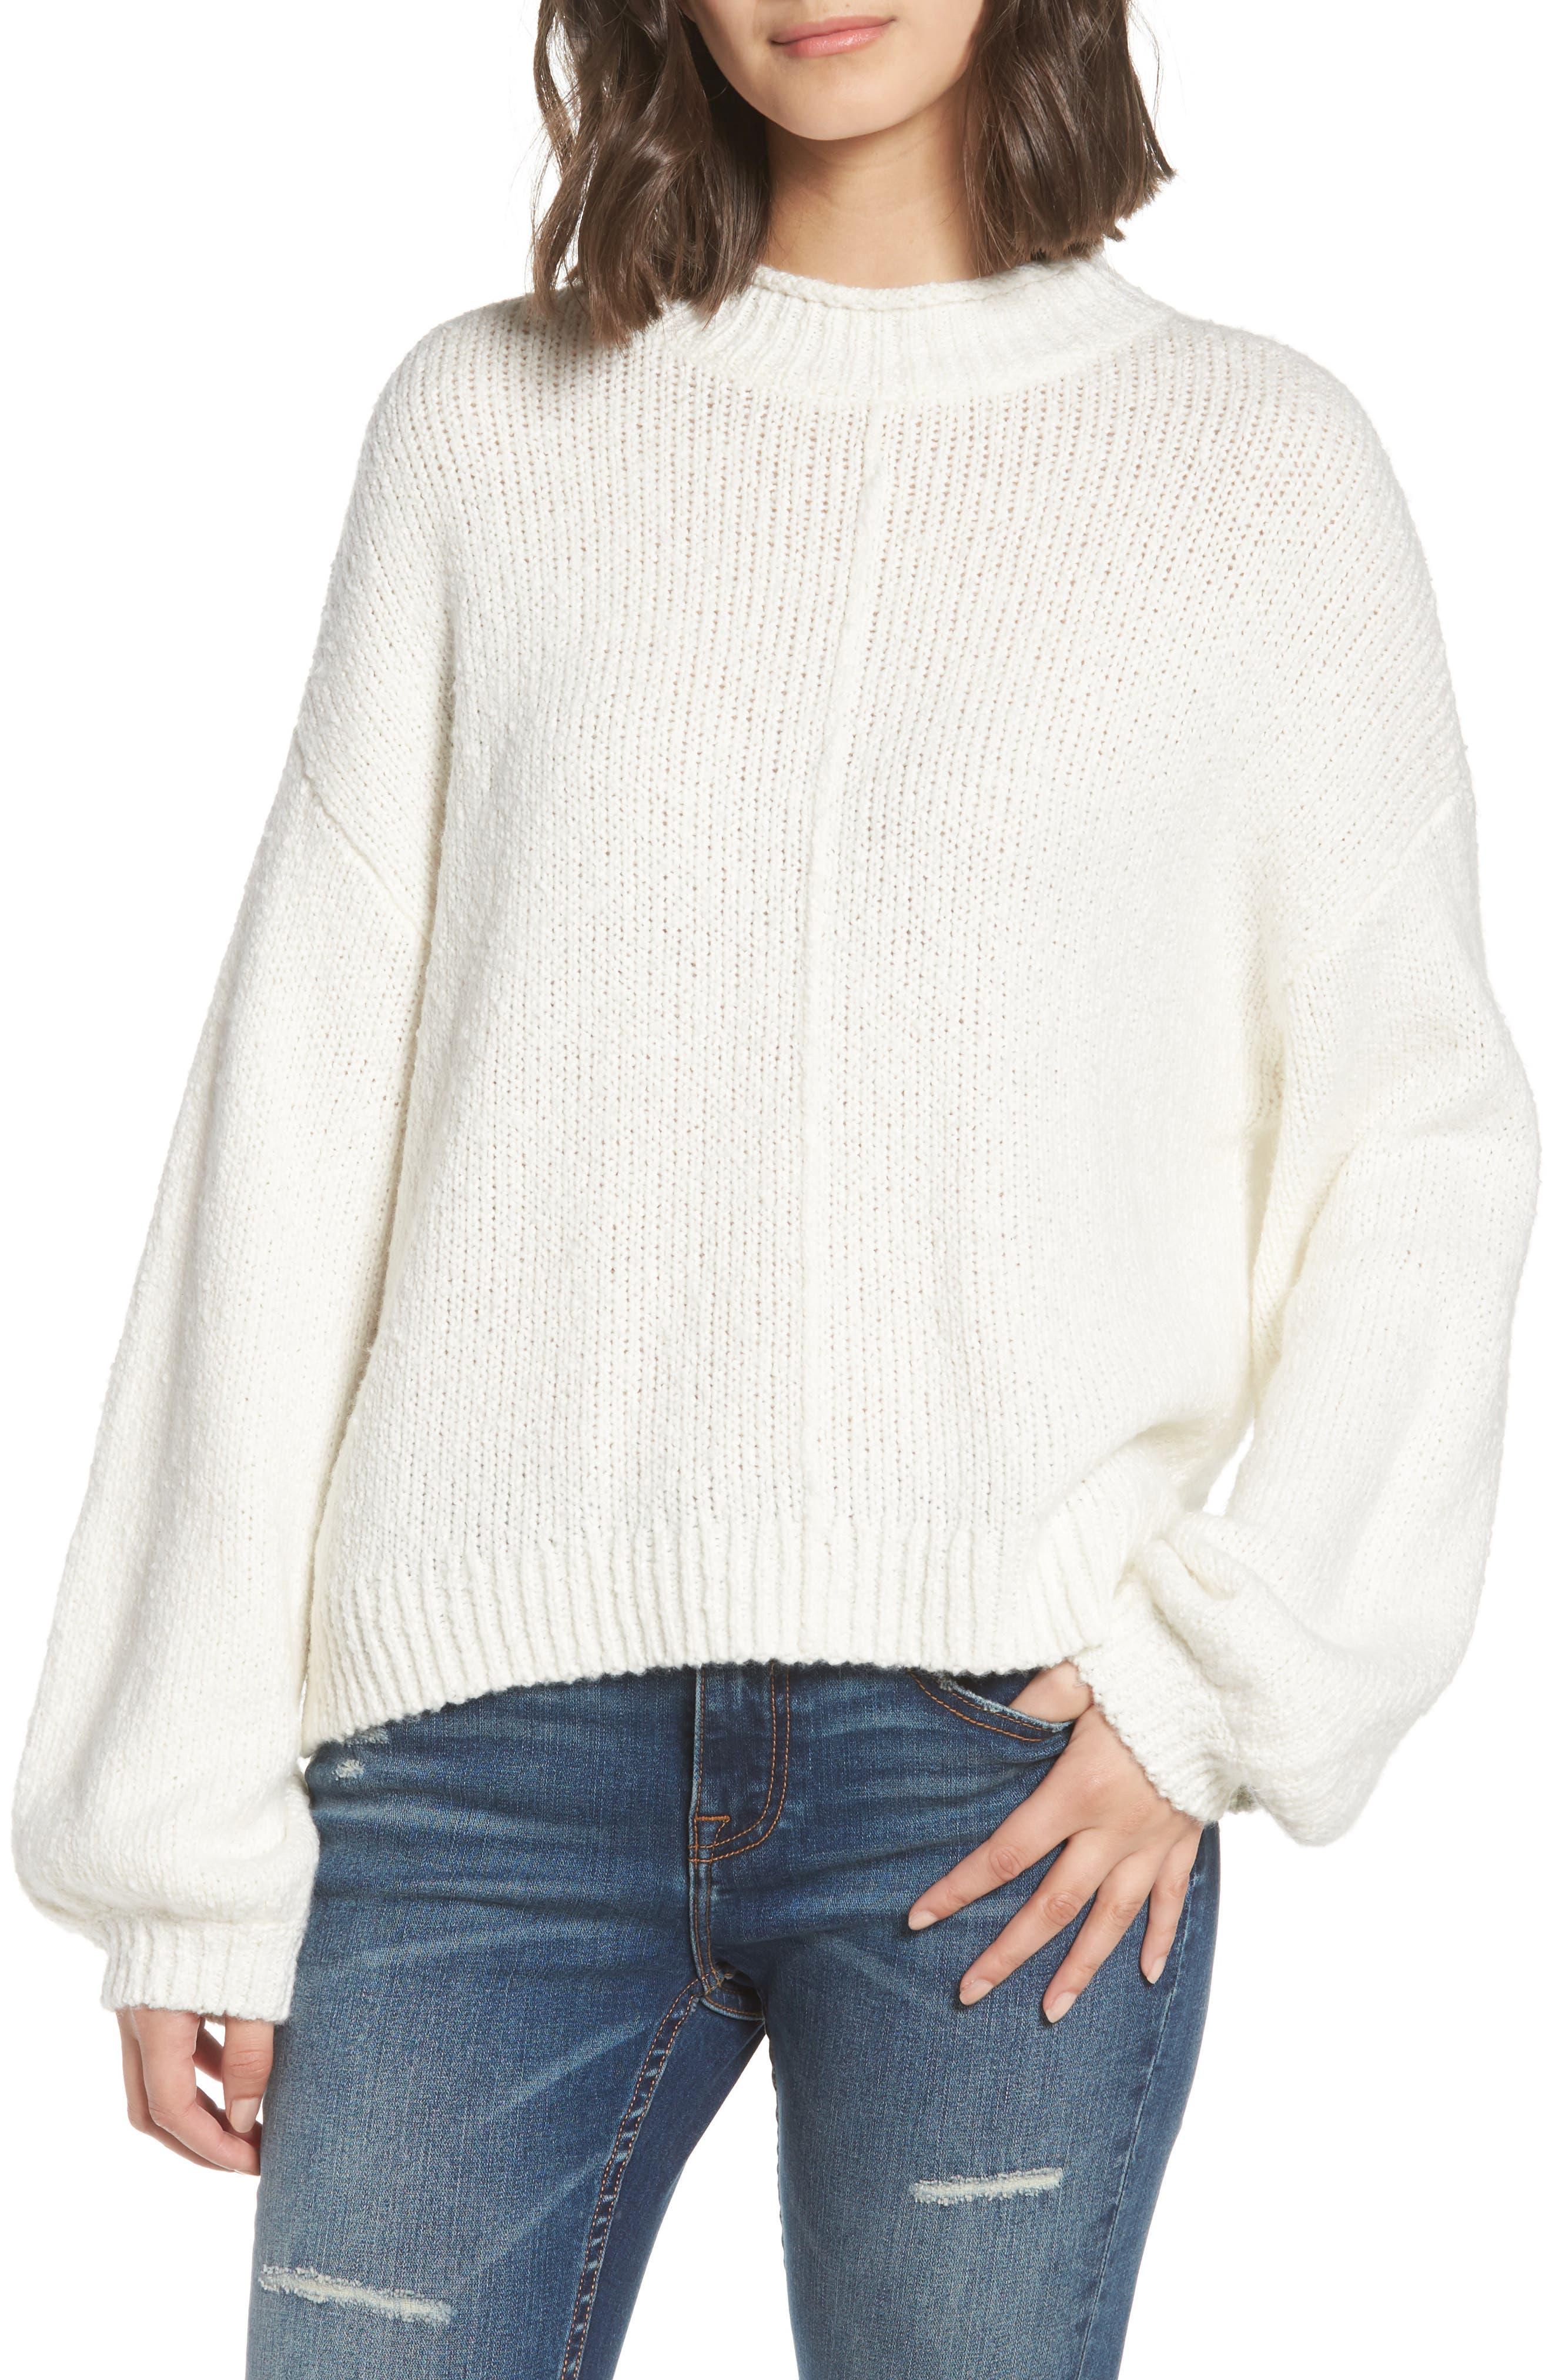 Balloon Sleeve Sweater,                             Main thumbnail 1, color,                             Ivory